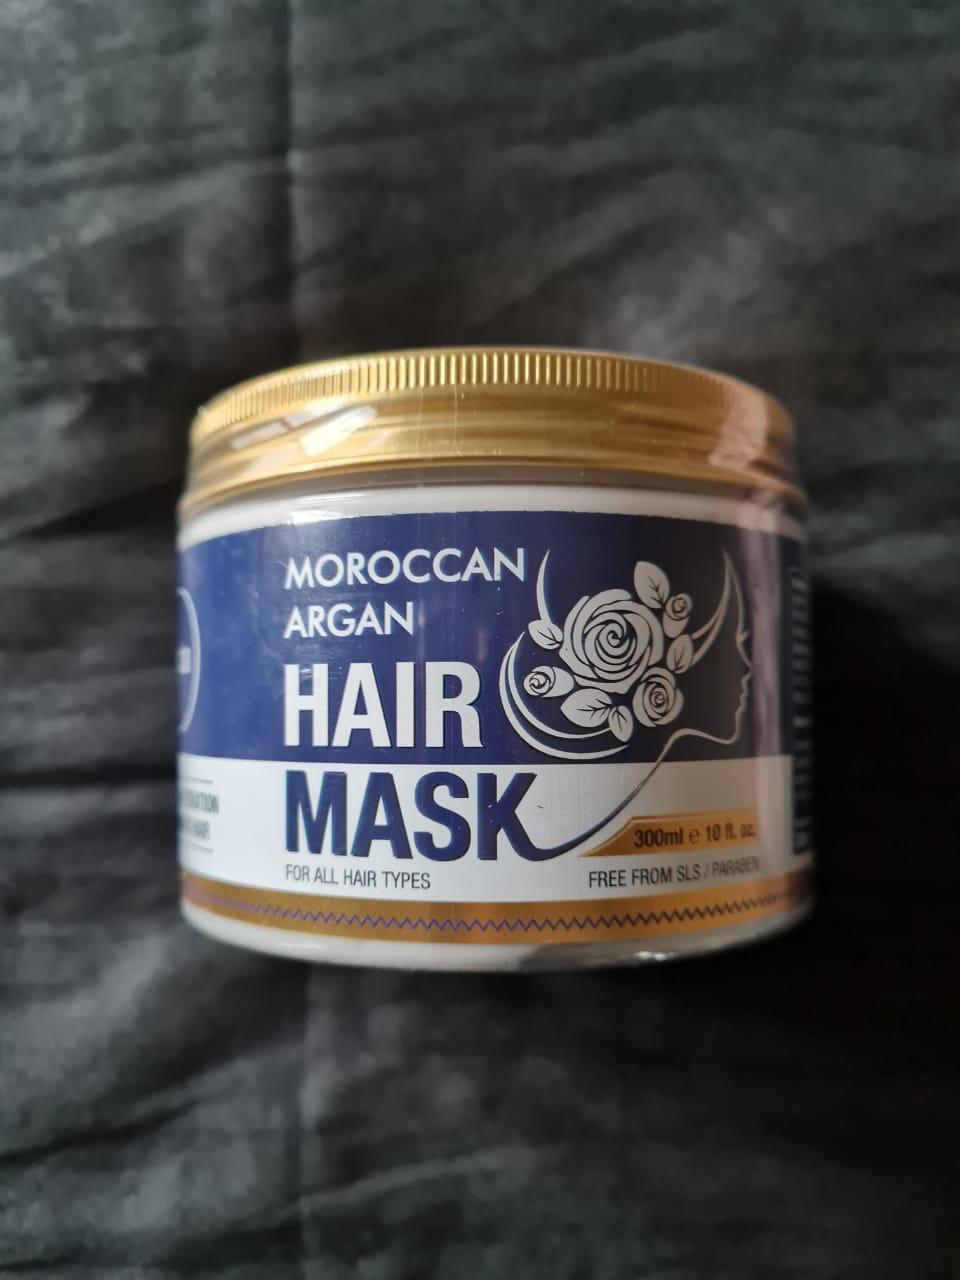 St.Botanica Moroccan Argan Hair Mask-Improves hair texture-By nisish